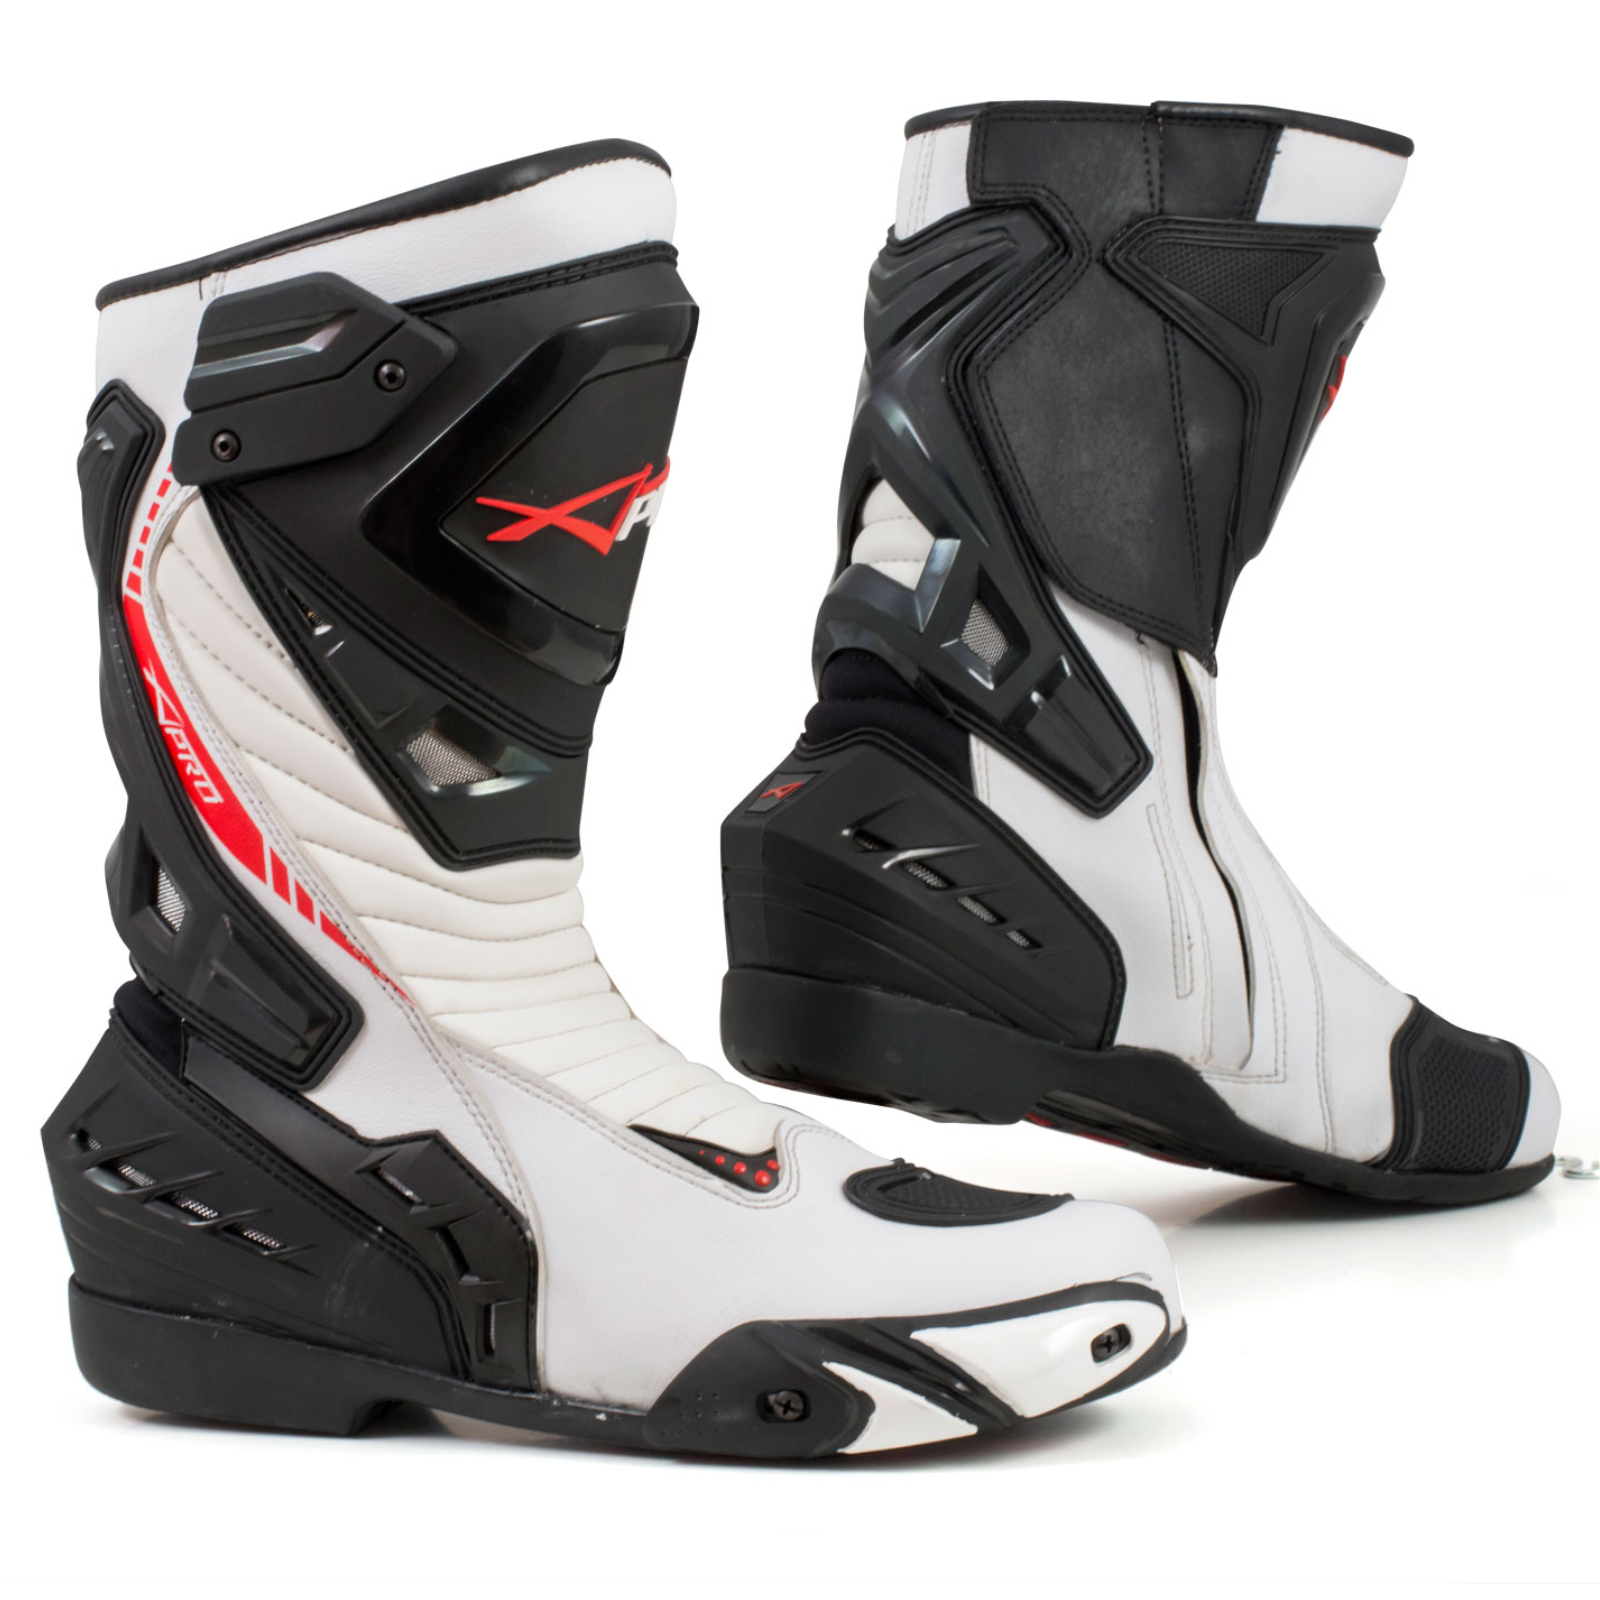 bottes moto sport racing piste strada technique microfibre blanc ebay. Black Bedroom Furniture Sets. Home Design Ideas